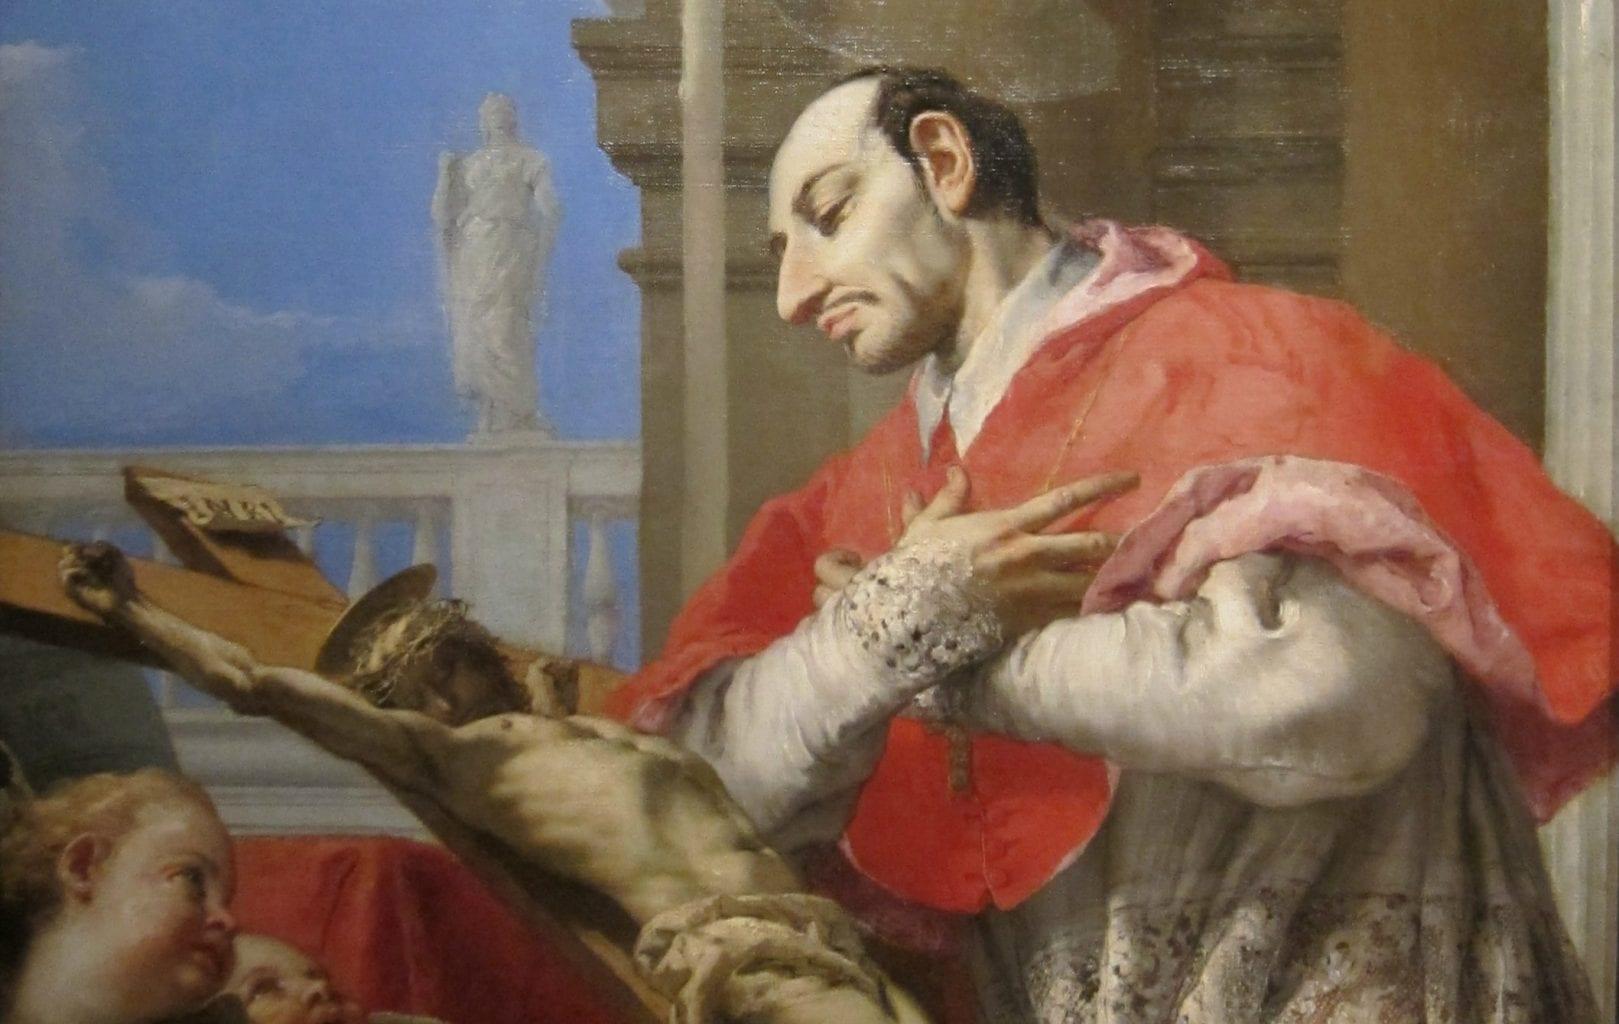 Prayer Must Come First – Charles Borromeo